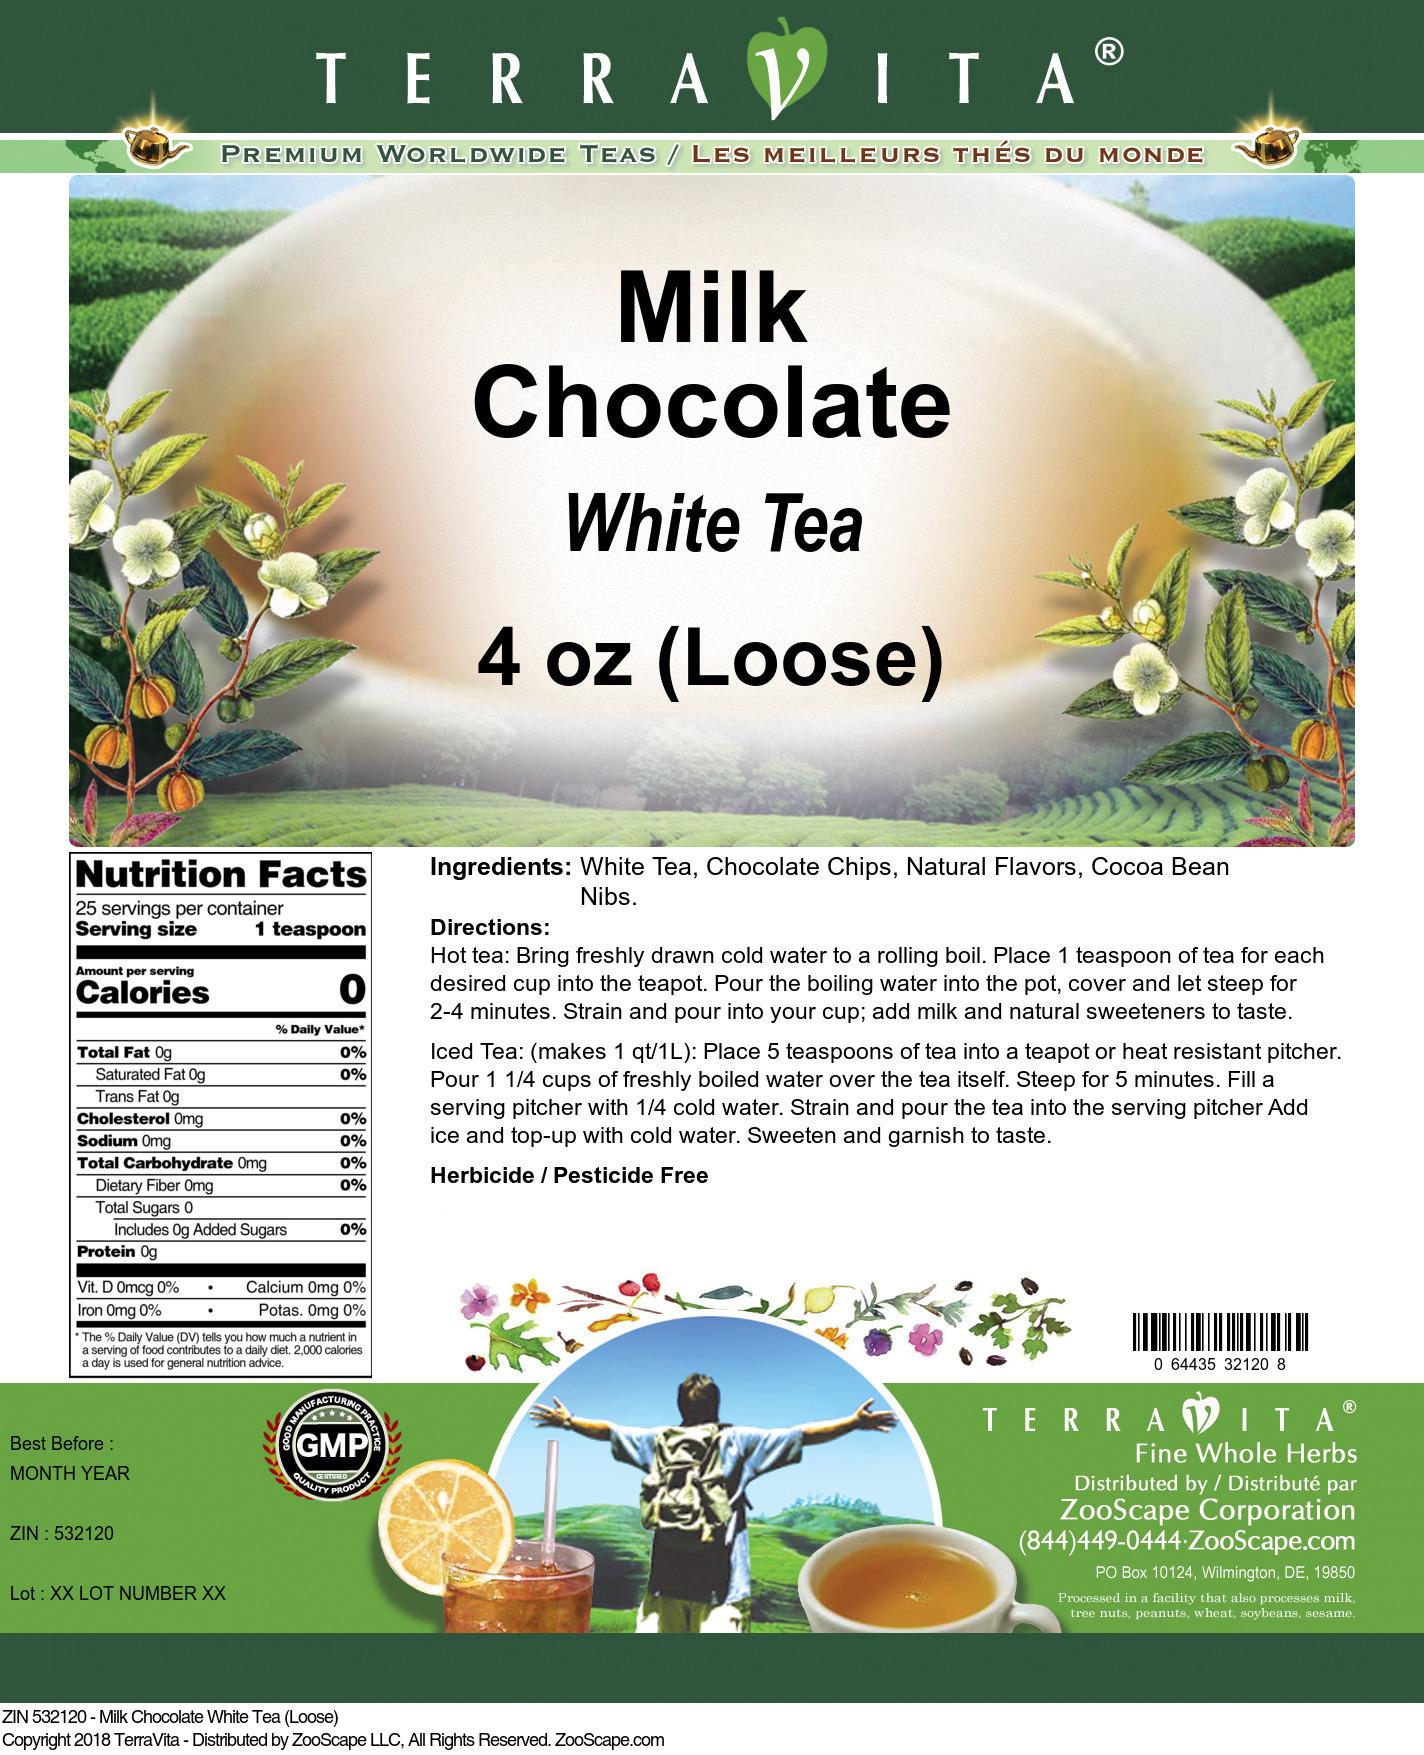 Milk Chocolate White Tea (Loose)